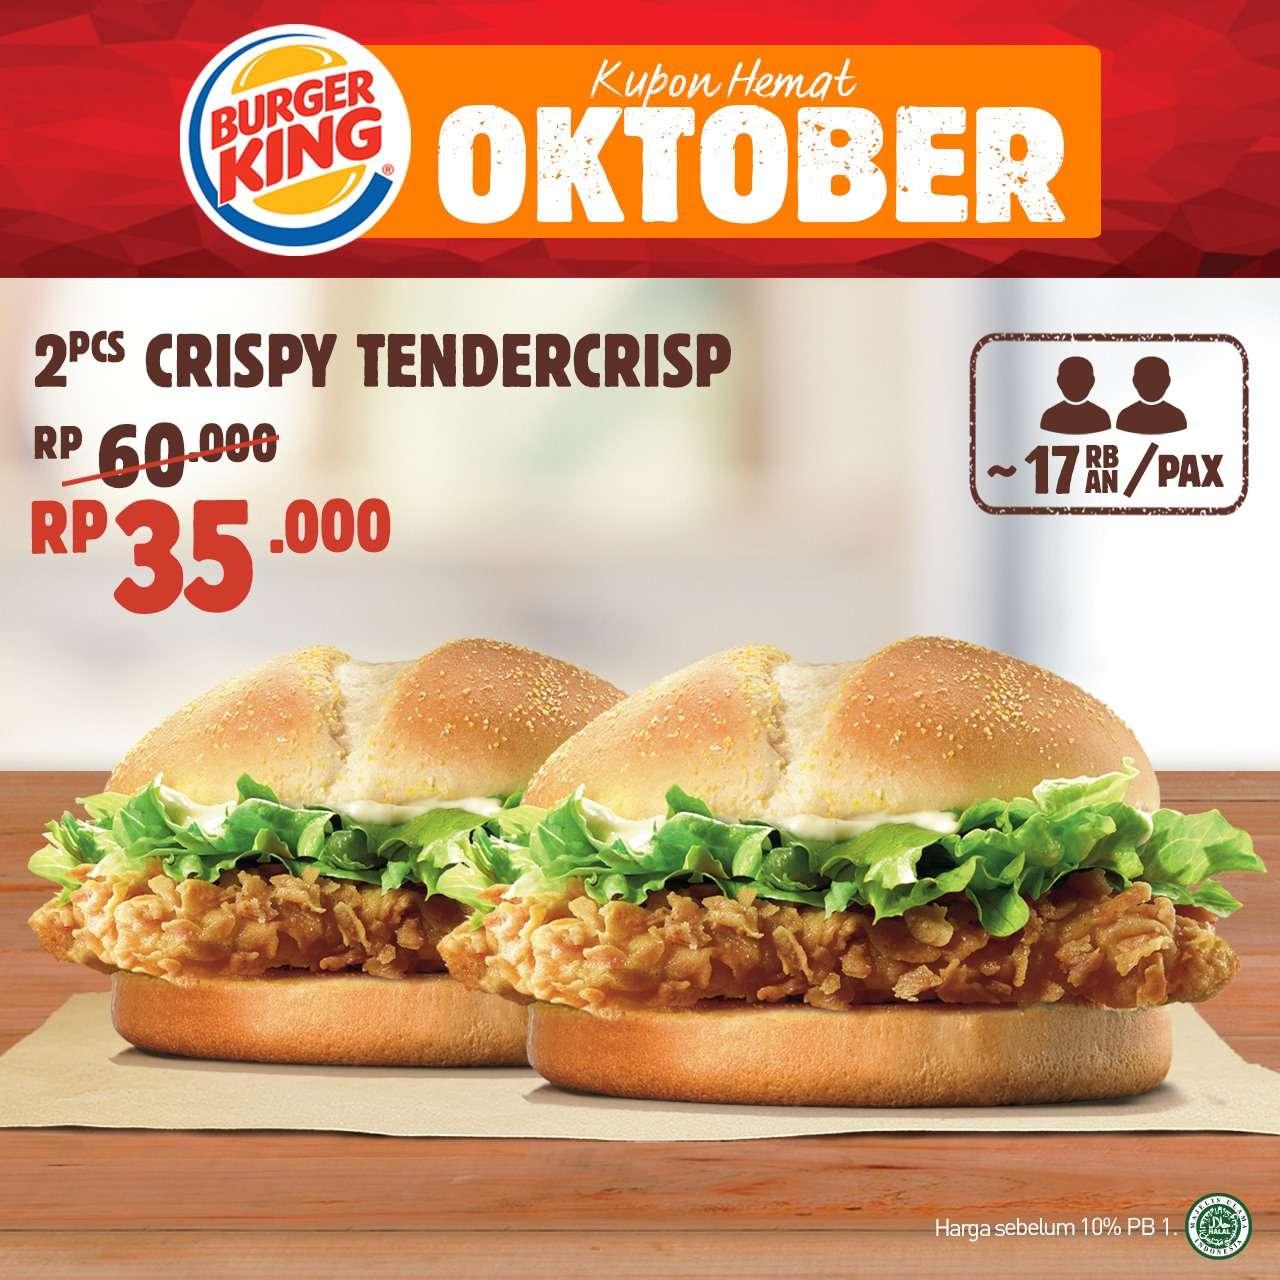 Burger King Promo Kupon Hemat Oktober 2019 Diskon Hingga